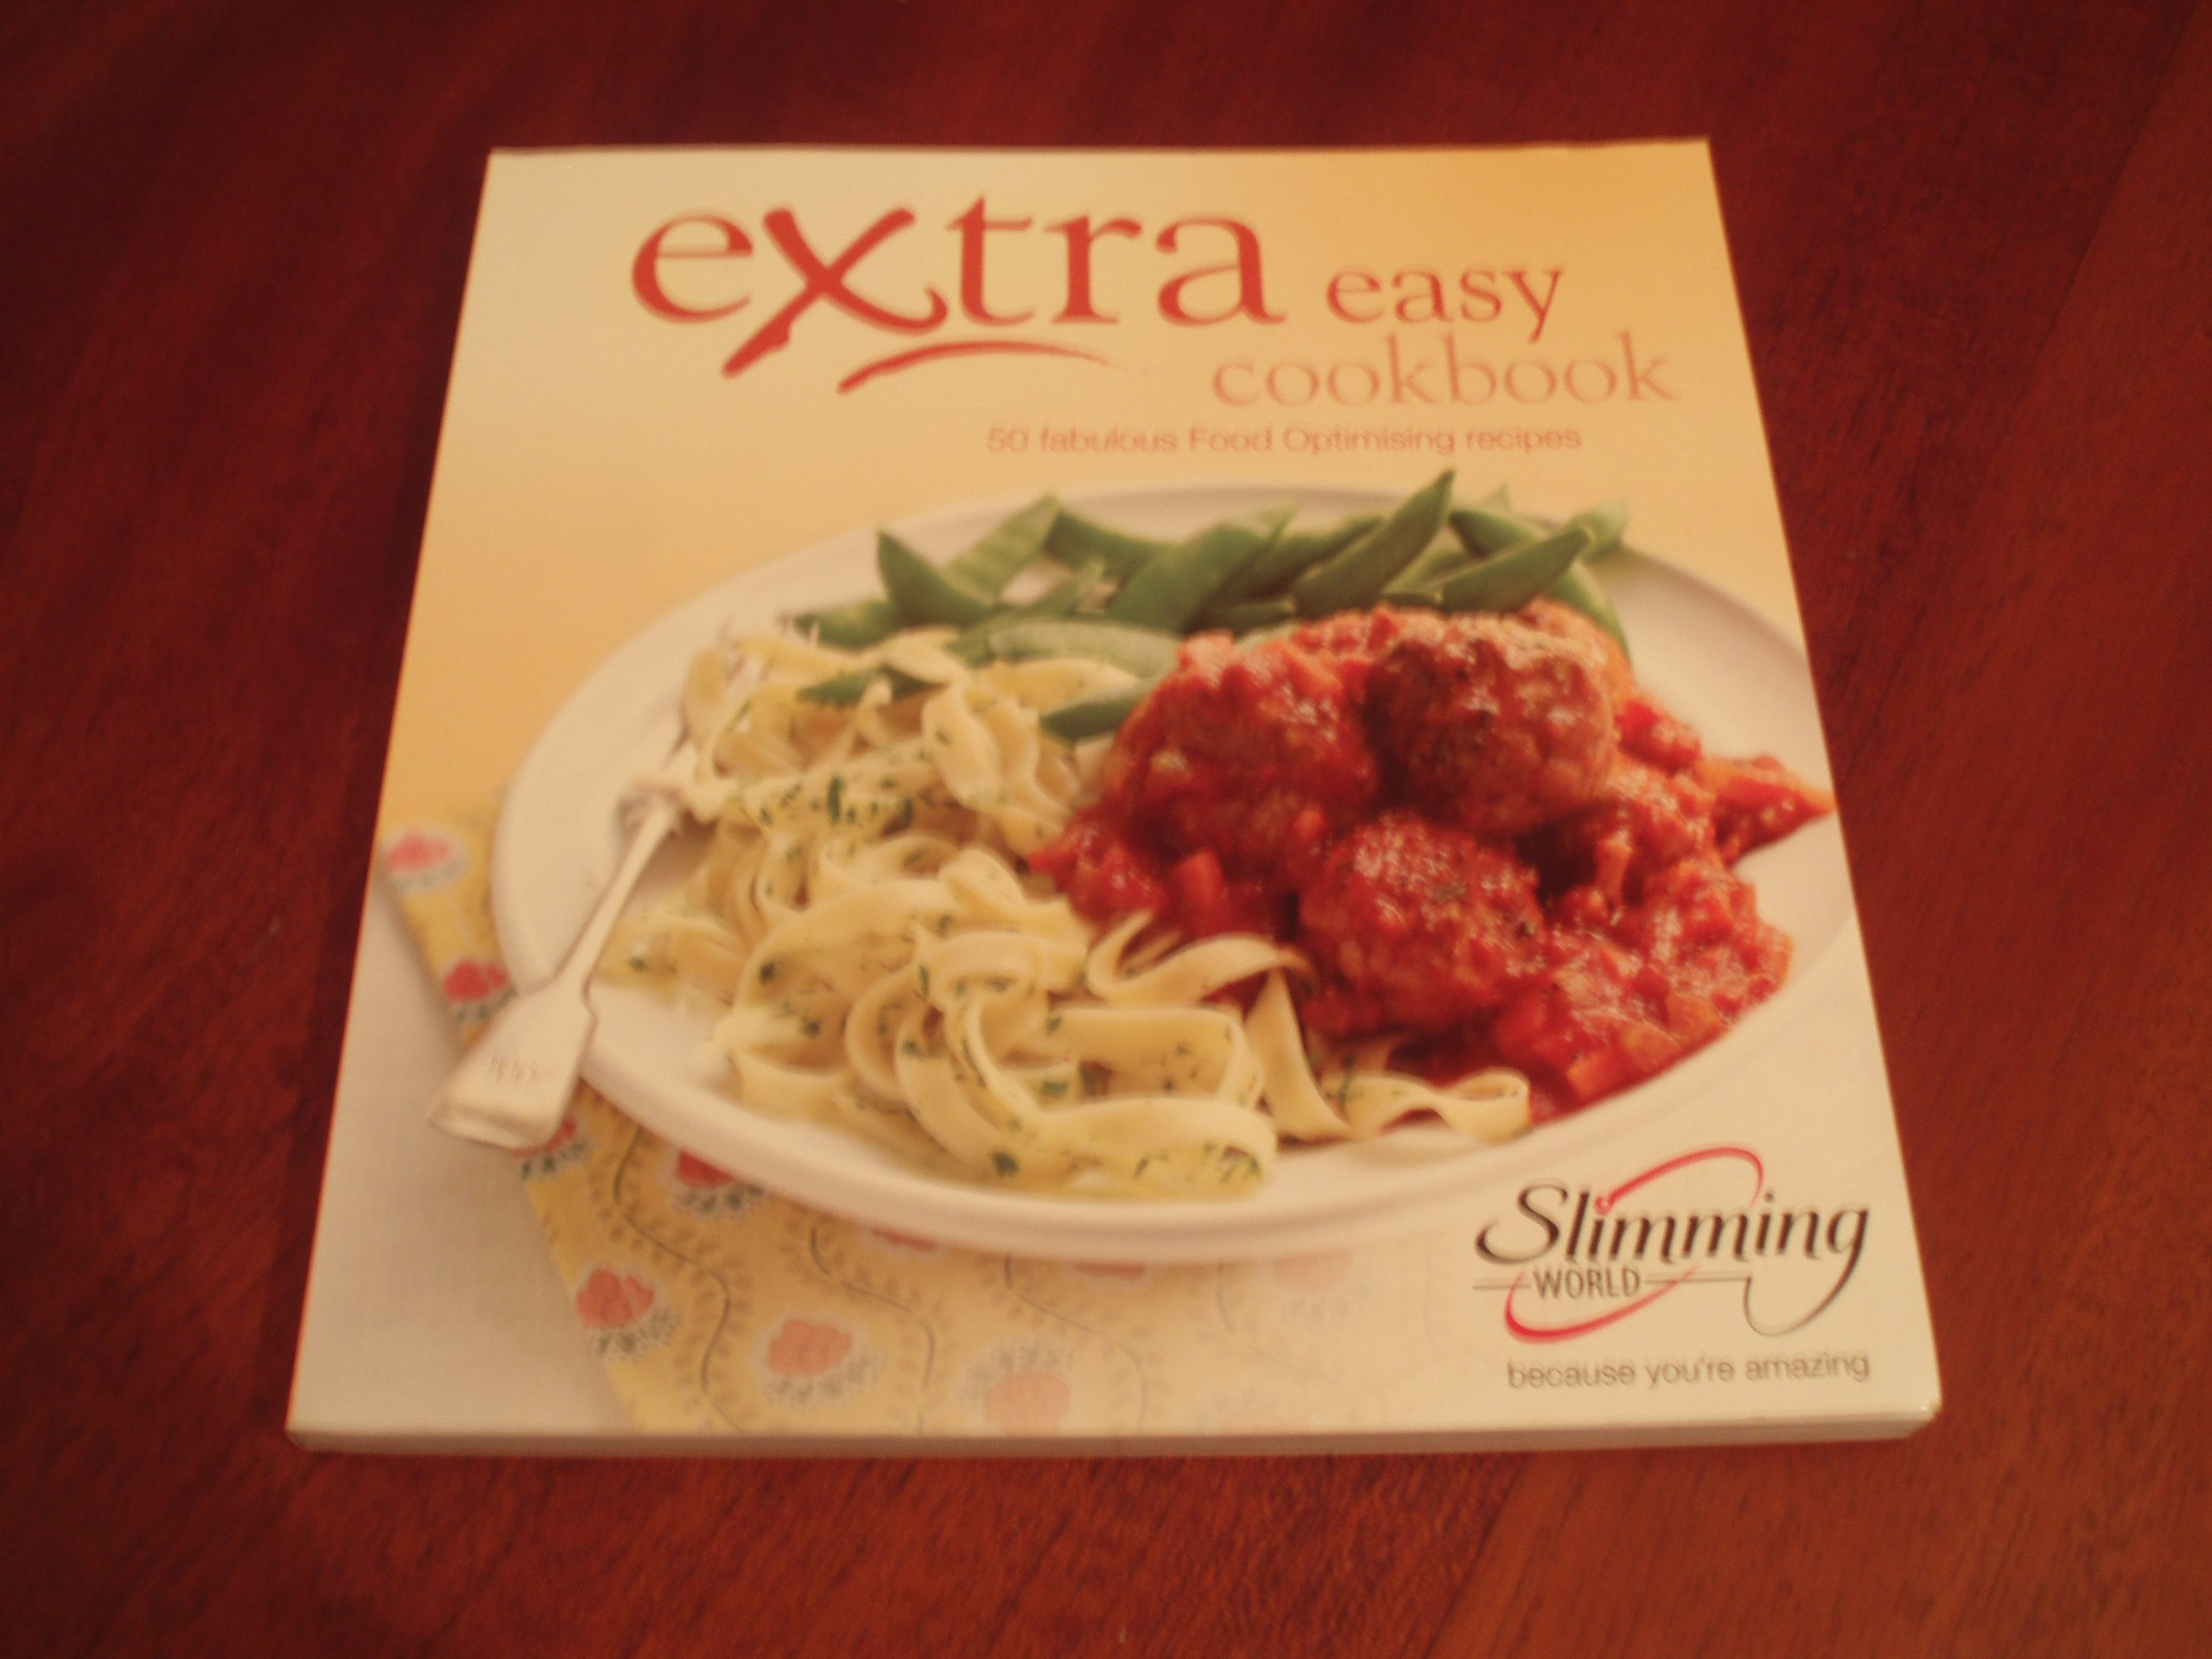 Slimming world extra easy cookbook amazon slimming world slimming world extra easy cookbook amazon slimming world books forumfinder Images